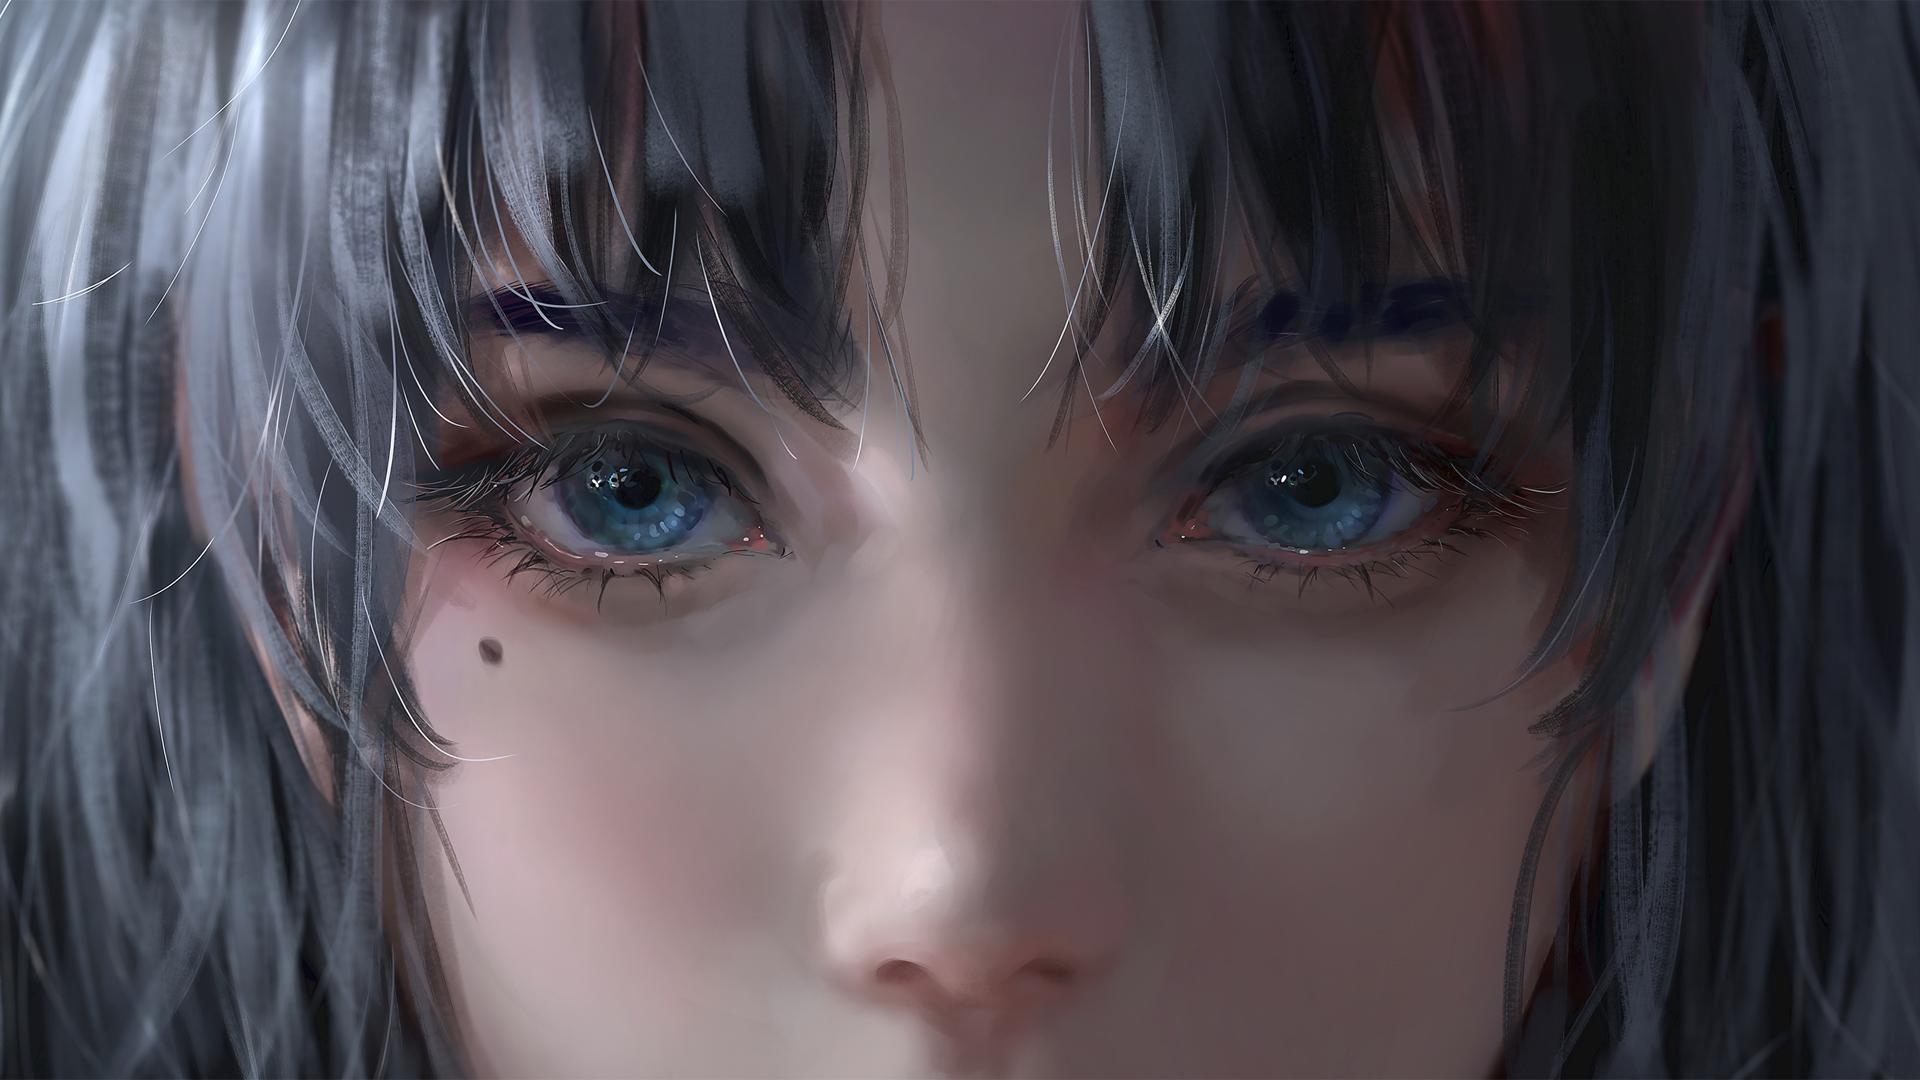 General 1920x1080 picture eyes digital painting gray hair blue eyes digital art face women